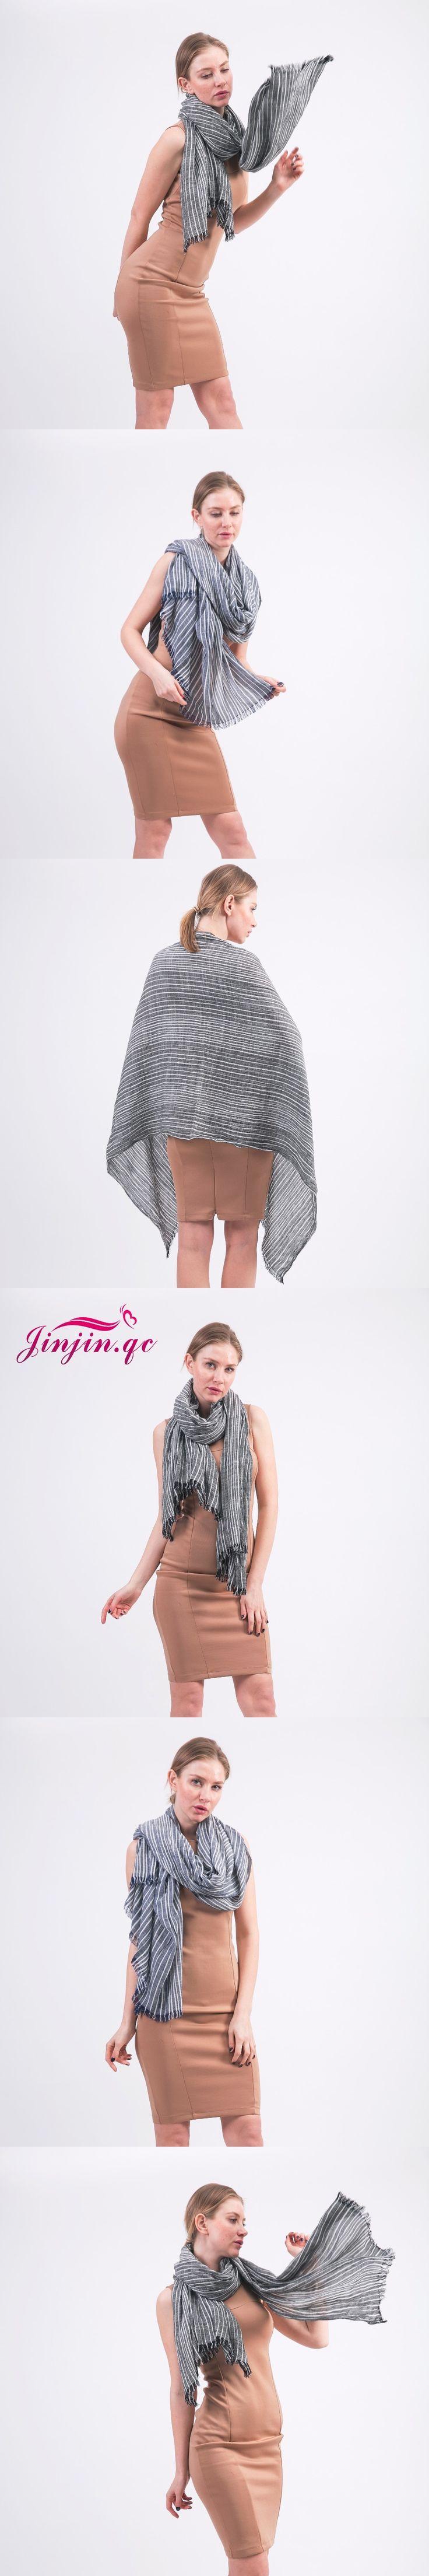 [Jinjin.QC] Brand linen Spring Scarf Men Tassel Bufandas Cachecol Striped Wrinkled Cotton Scarves bandana echarpe foulard femme